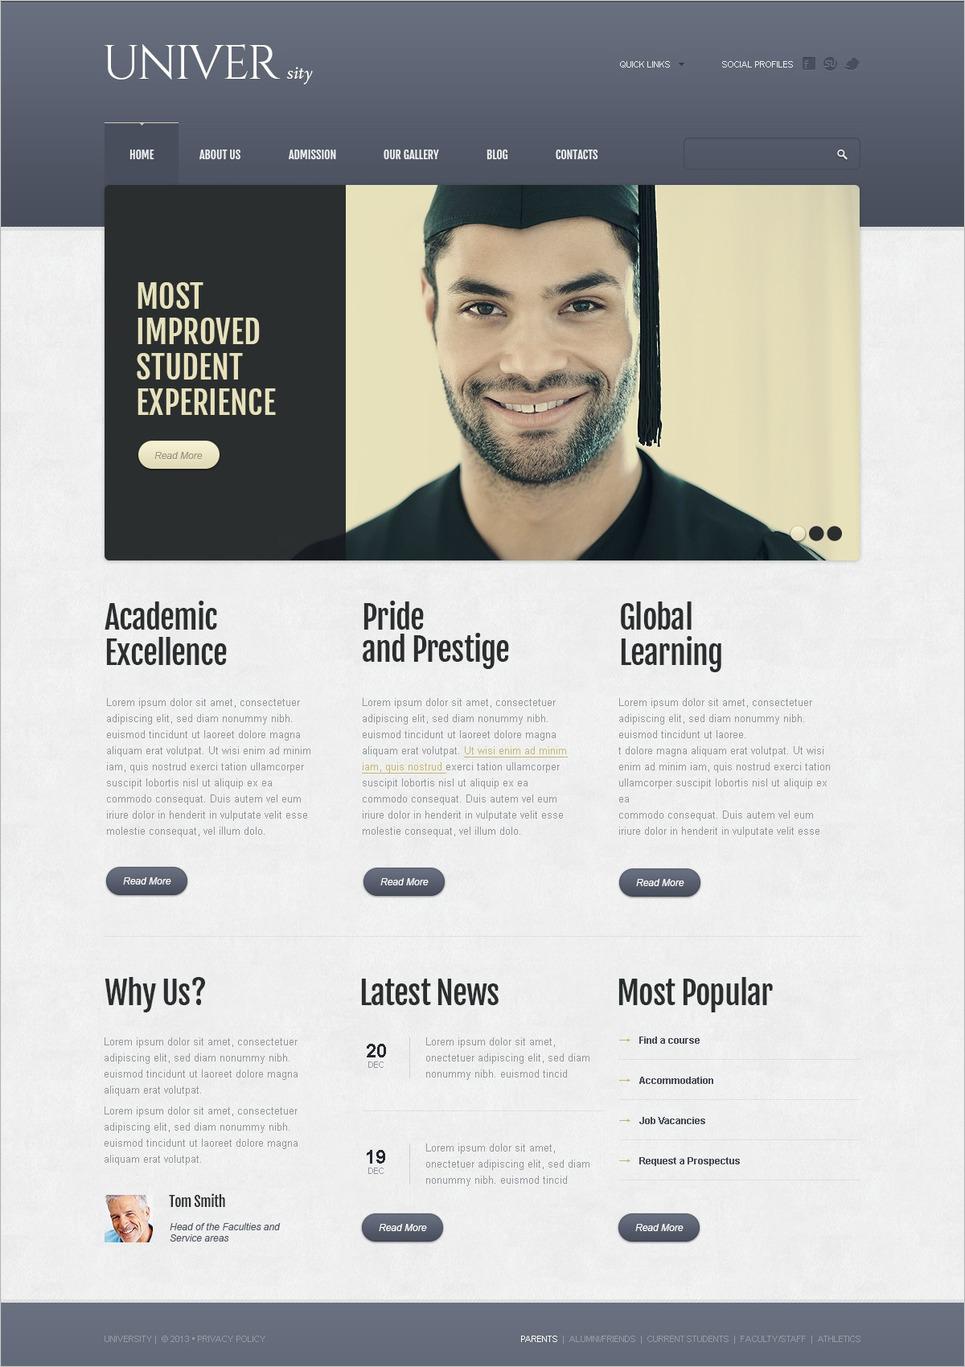 Drupal Responsive Website Template for University